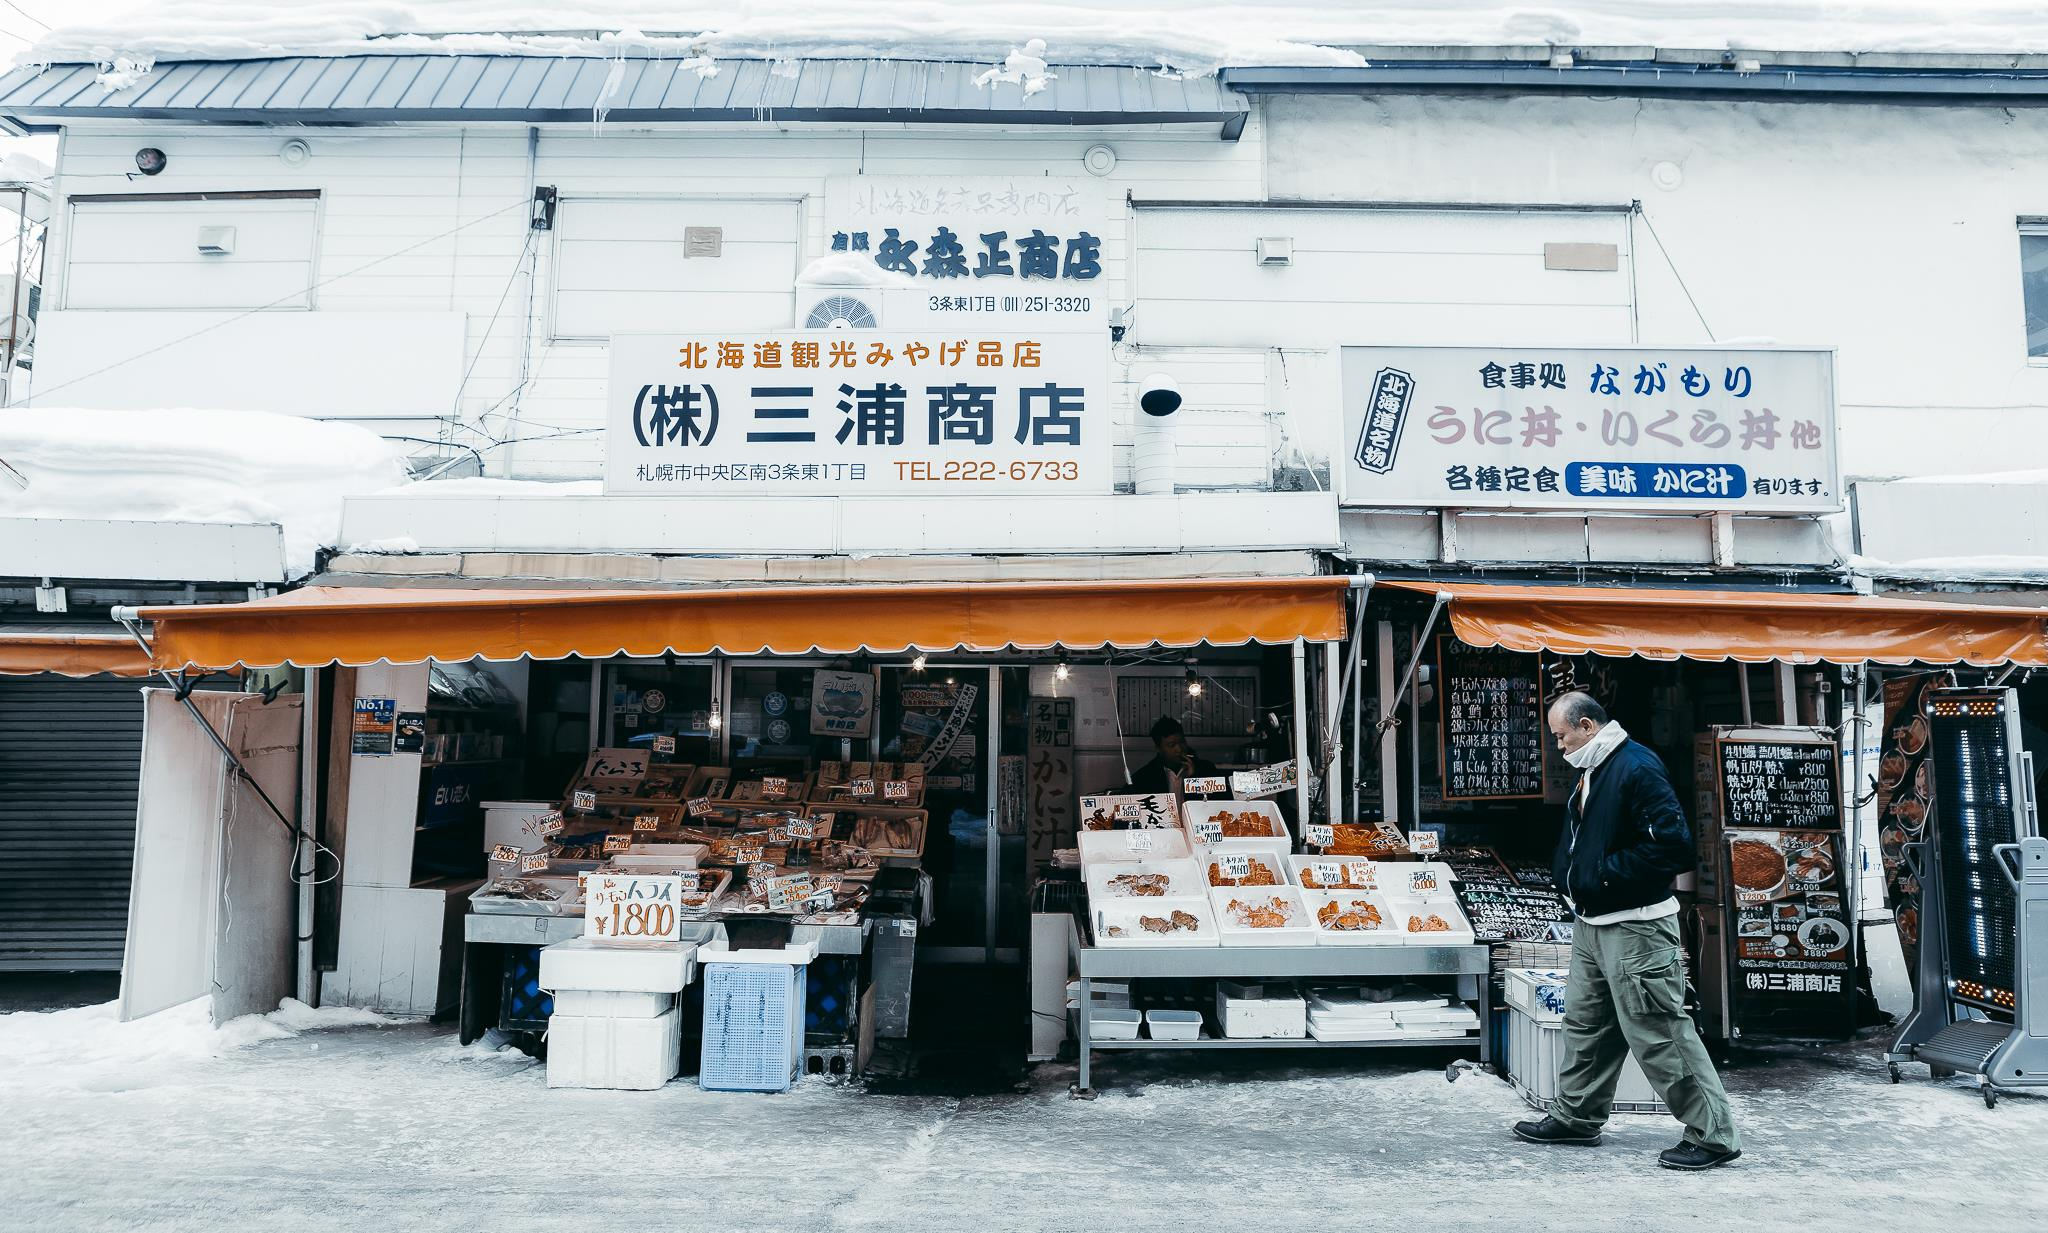 Hokkaido tuyet trang, noi dang den nhat mua dong o Nhat Ban hinh anh 39